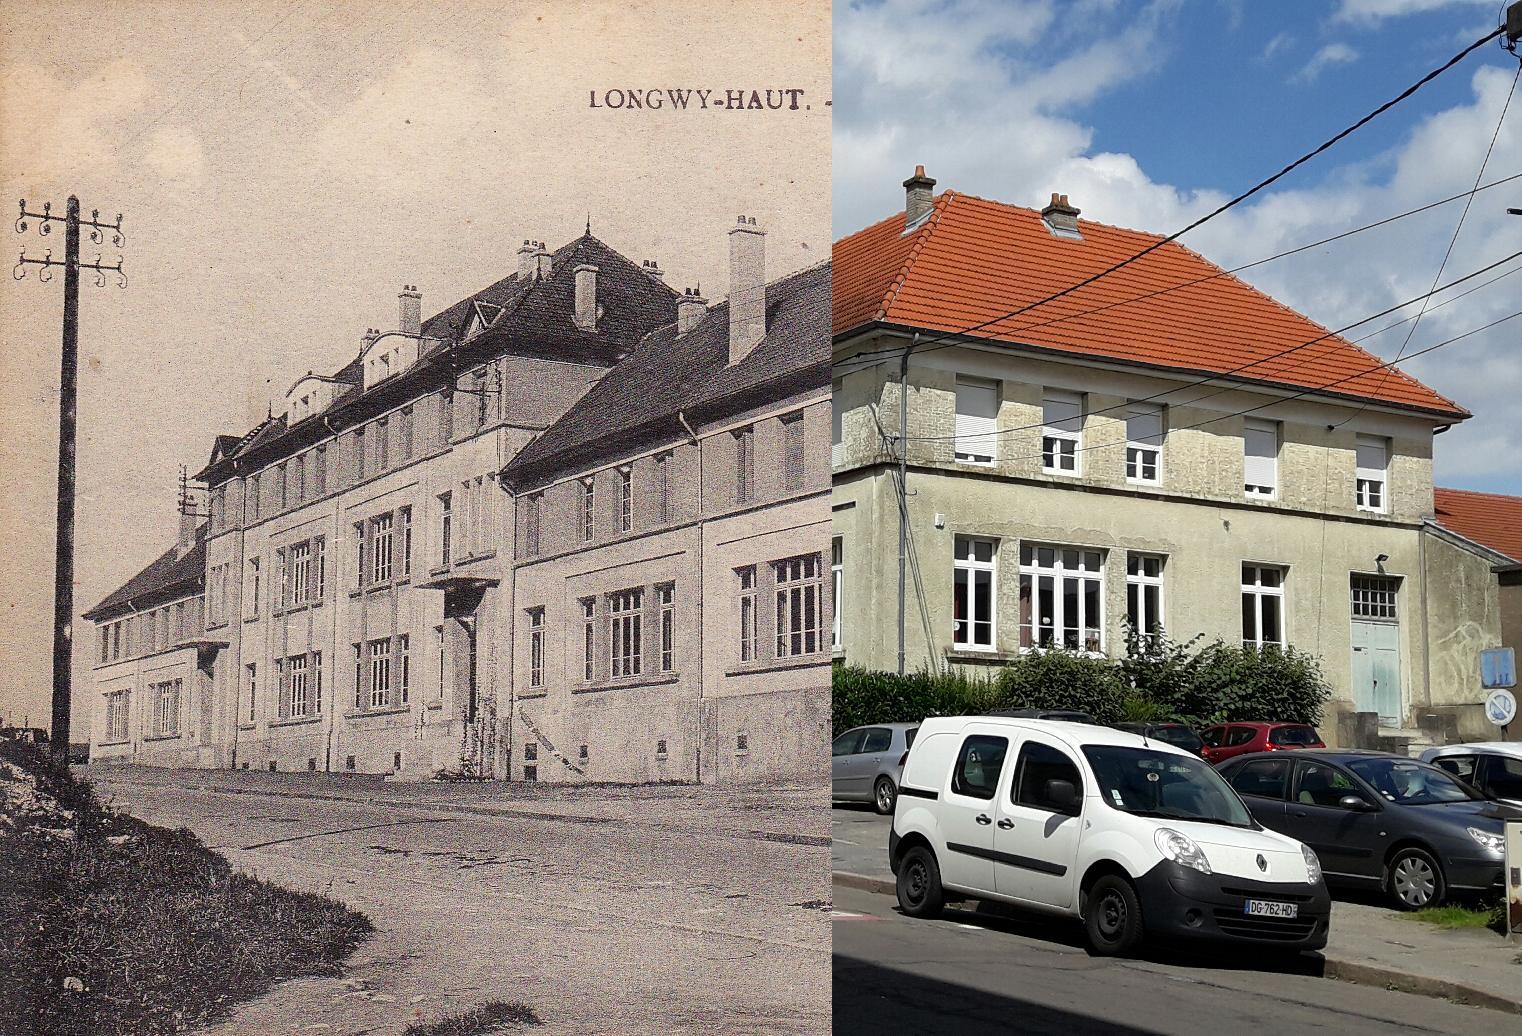 Longwy - Ecole primaire Porte de Bourgogne, Longwy-Haut.